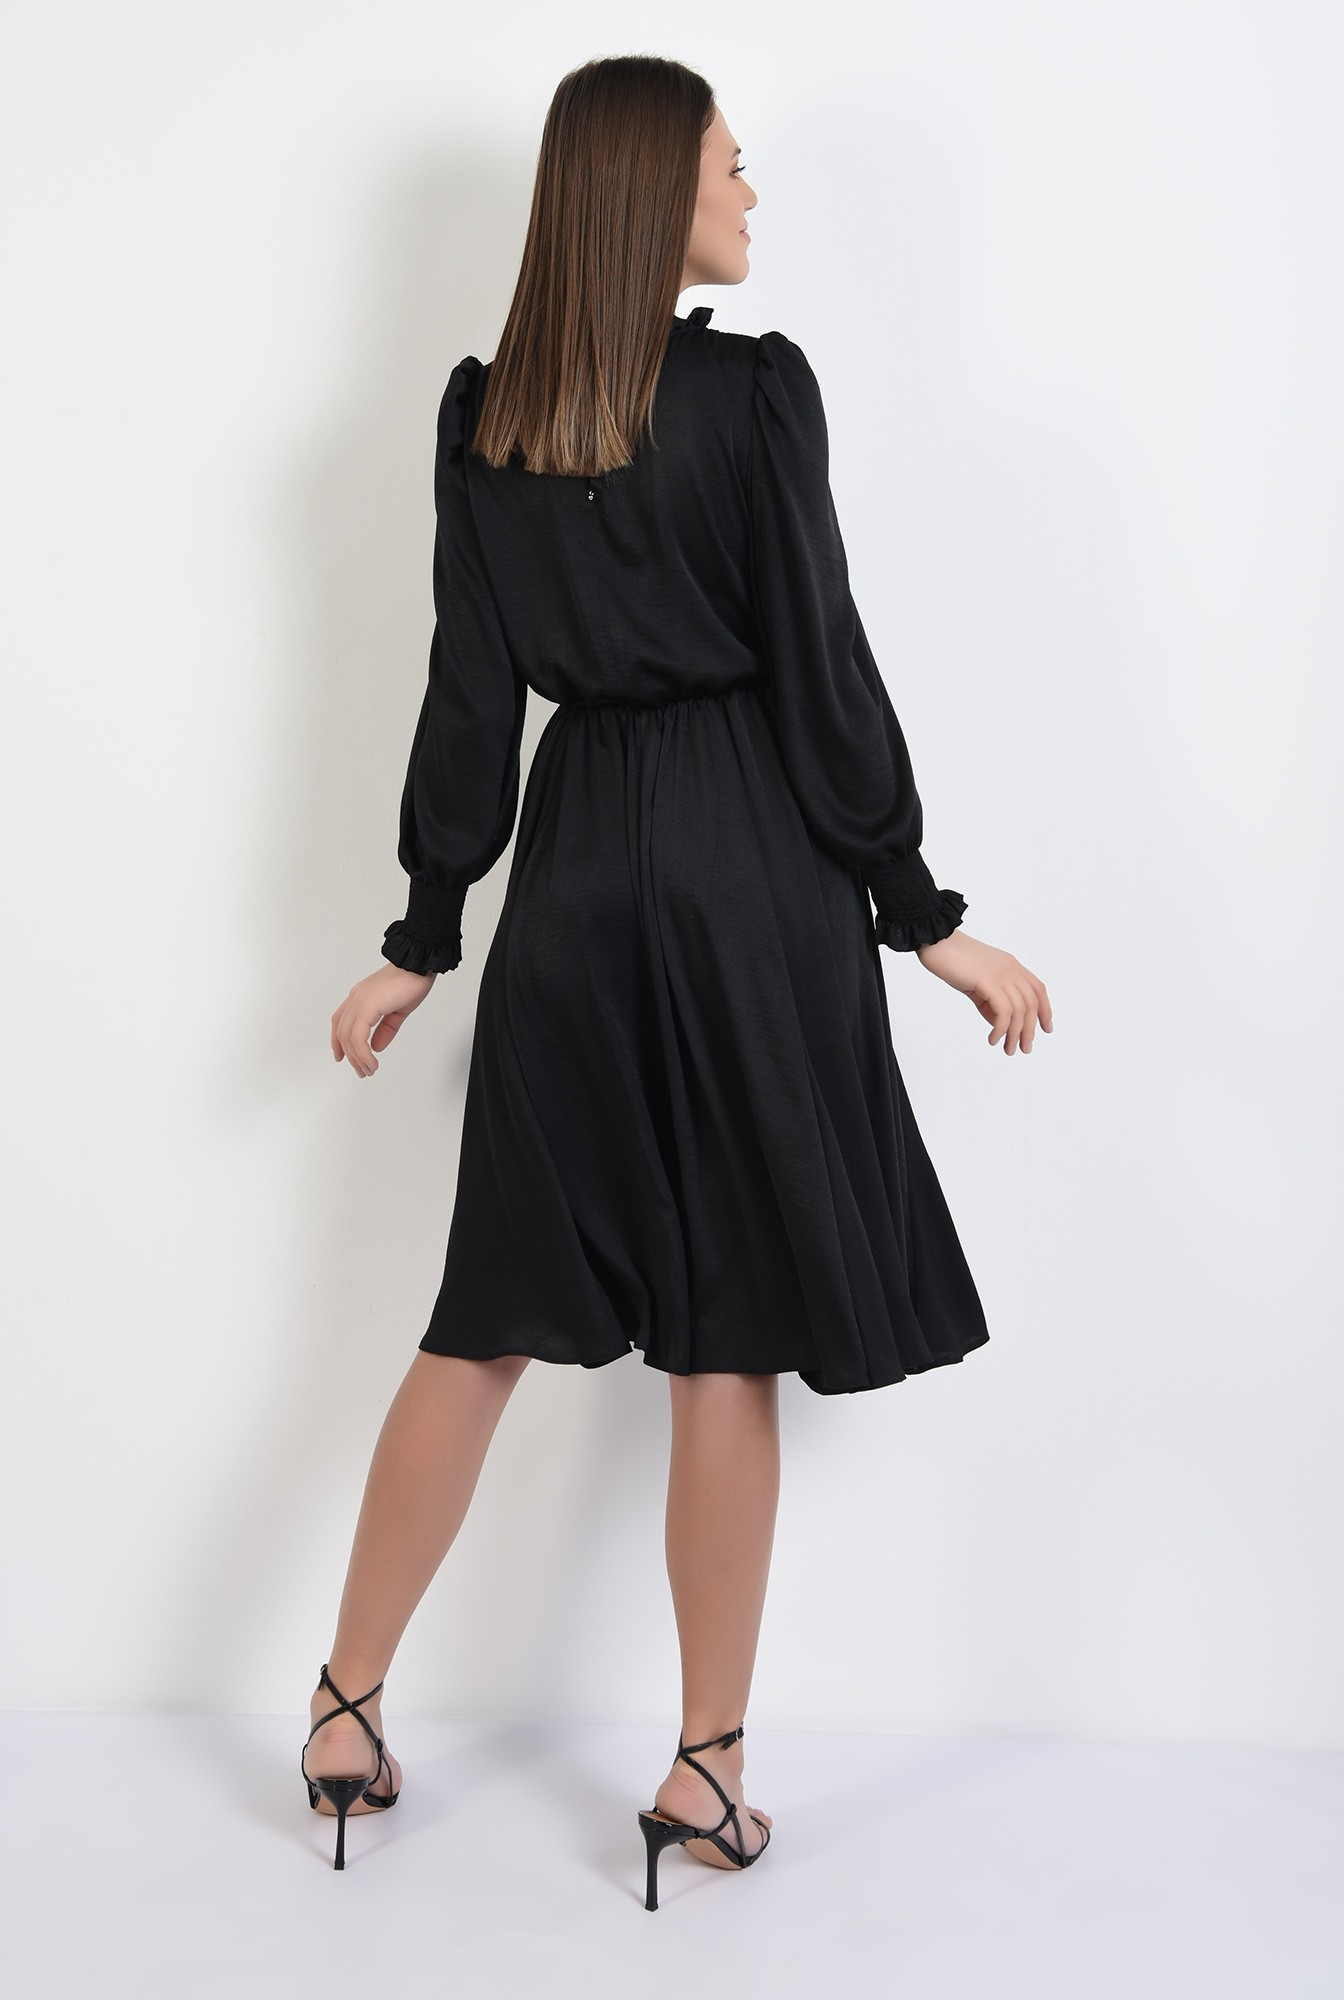 1 - rochie midi, evazata, guler incretit, talie pe elastic, inchidere cu butoniera